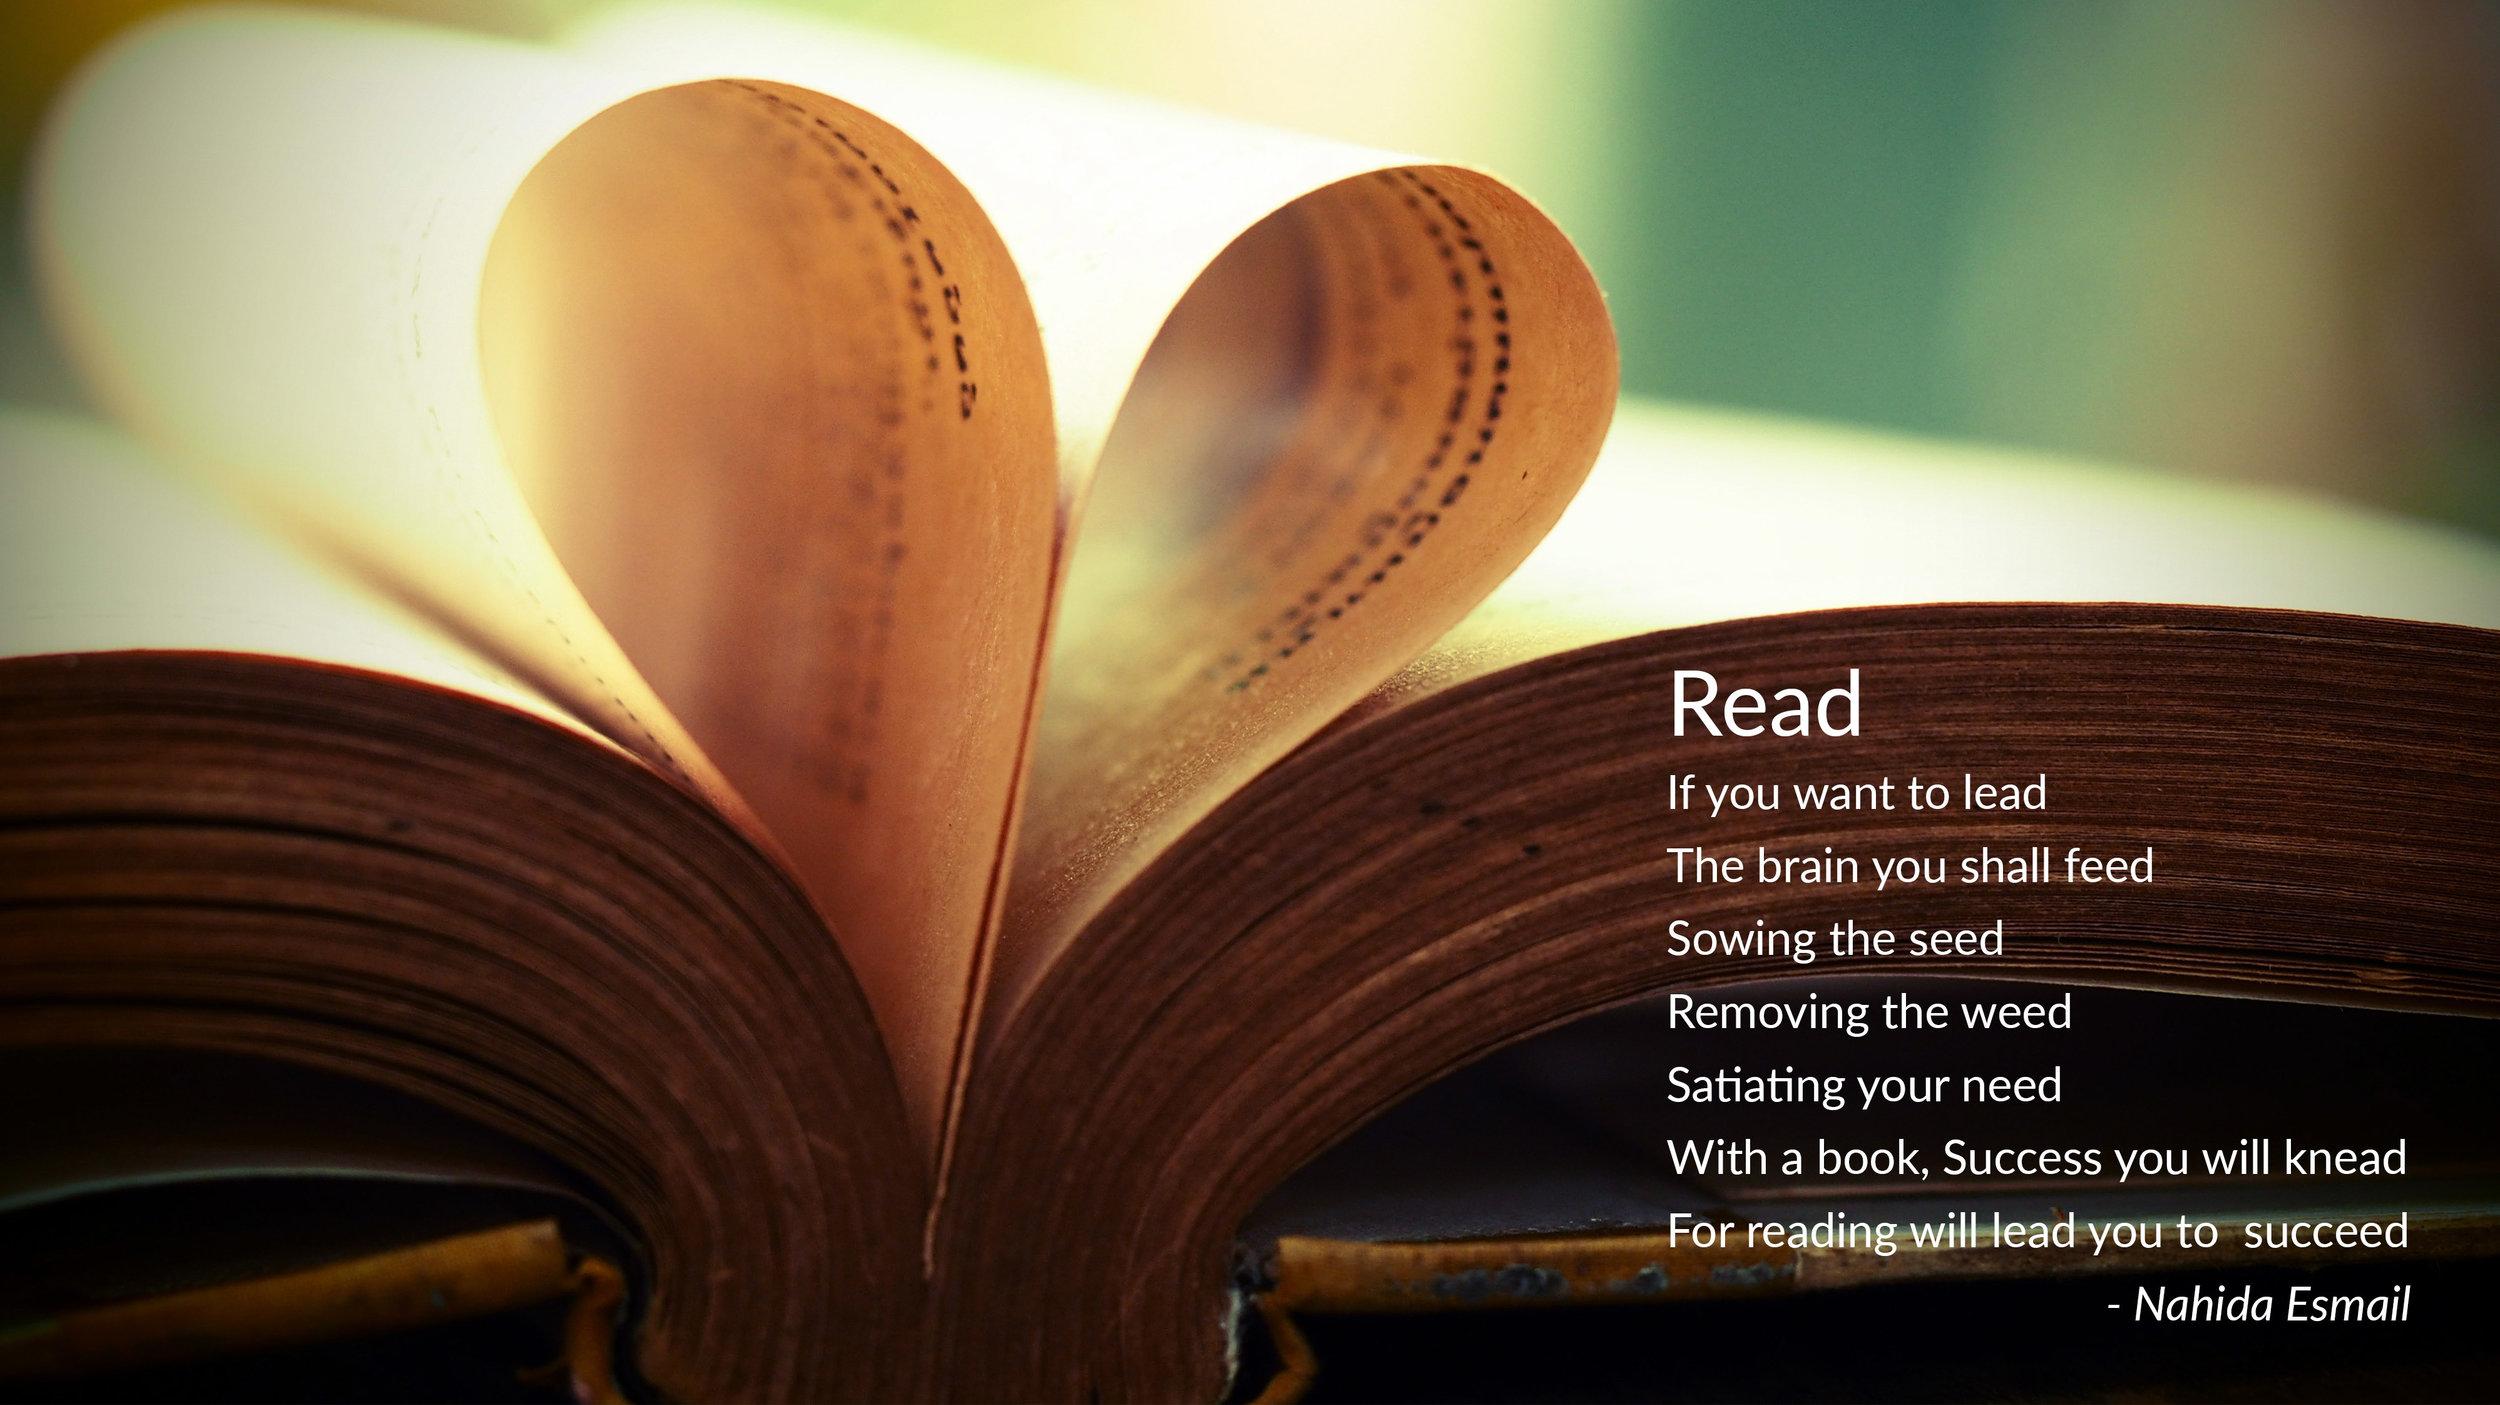 Read2.jpg